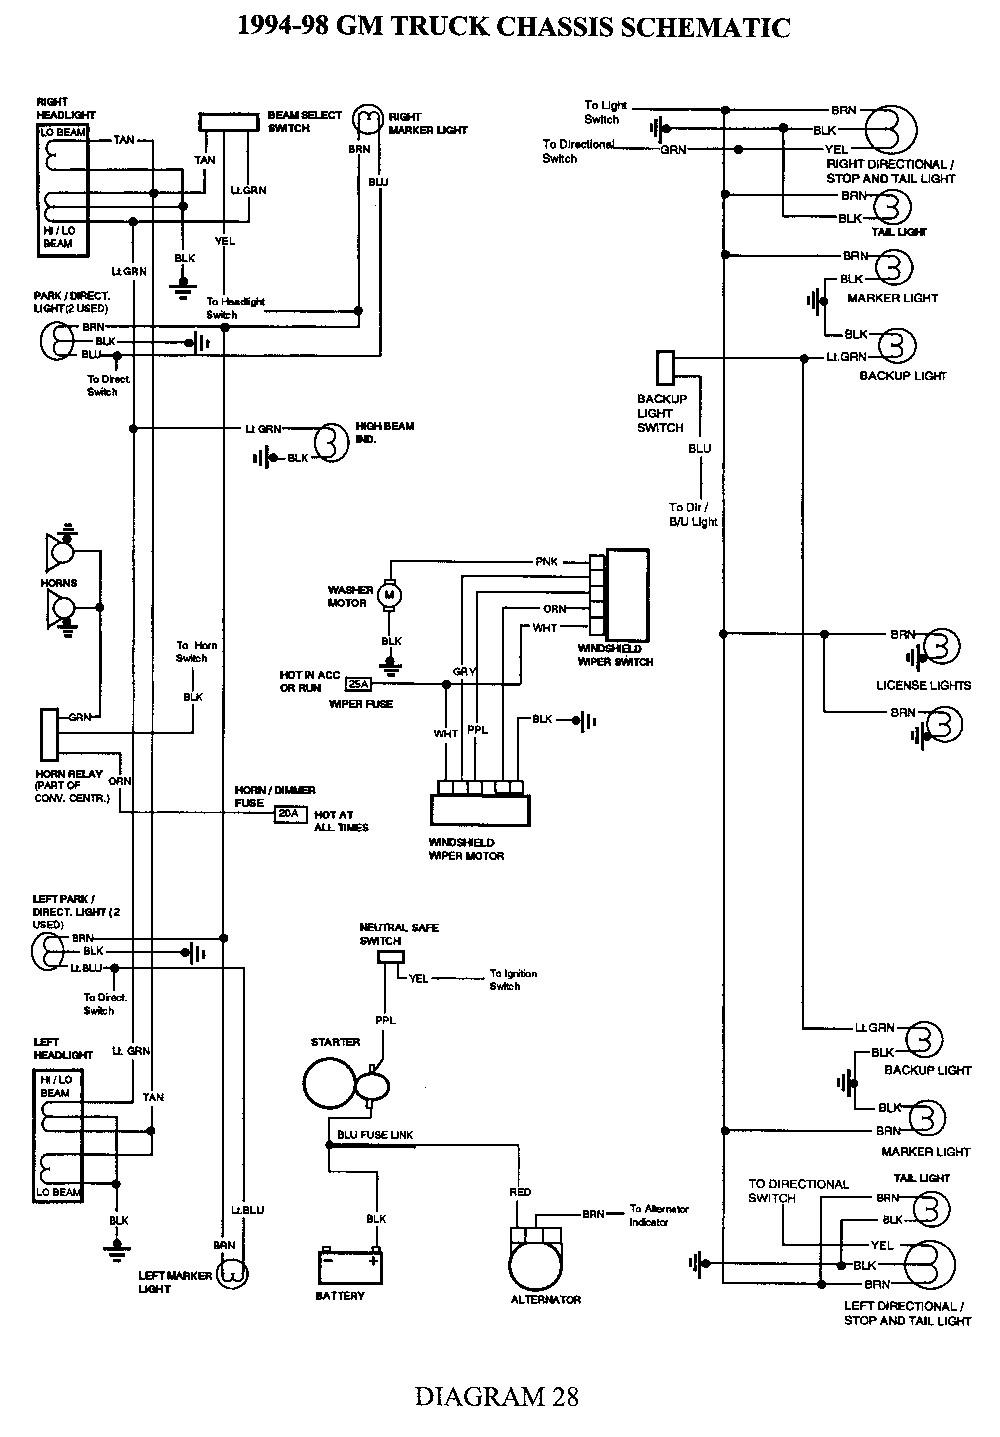 Pontiac Gto Ignition Switch Wiring Diagram Enthusiast Jeep 89 Chevy Truck Custom U2022 Rh Littlewaves Co Lawn Mower